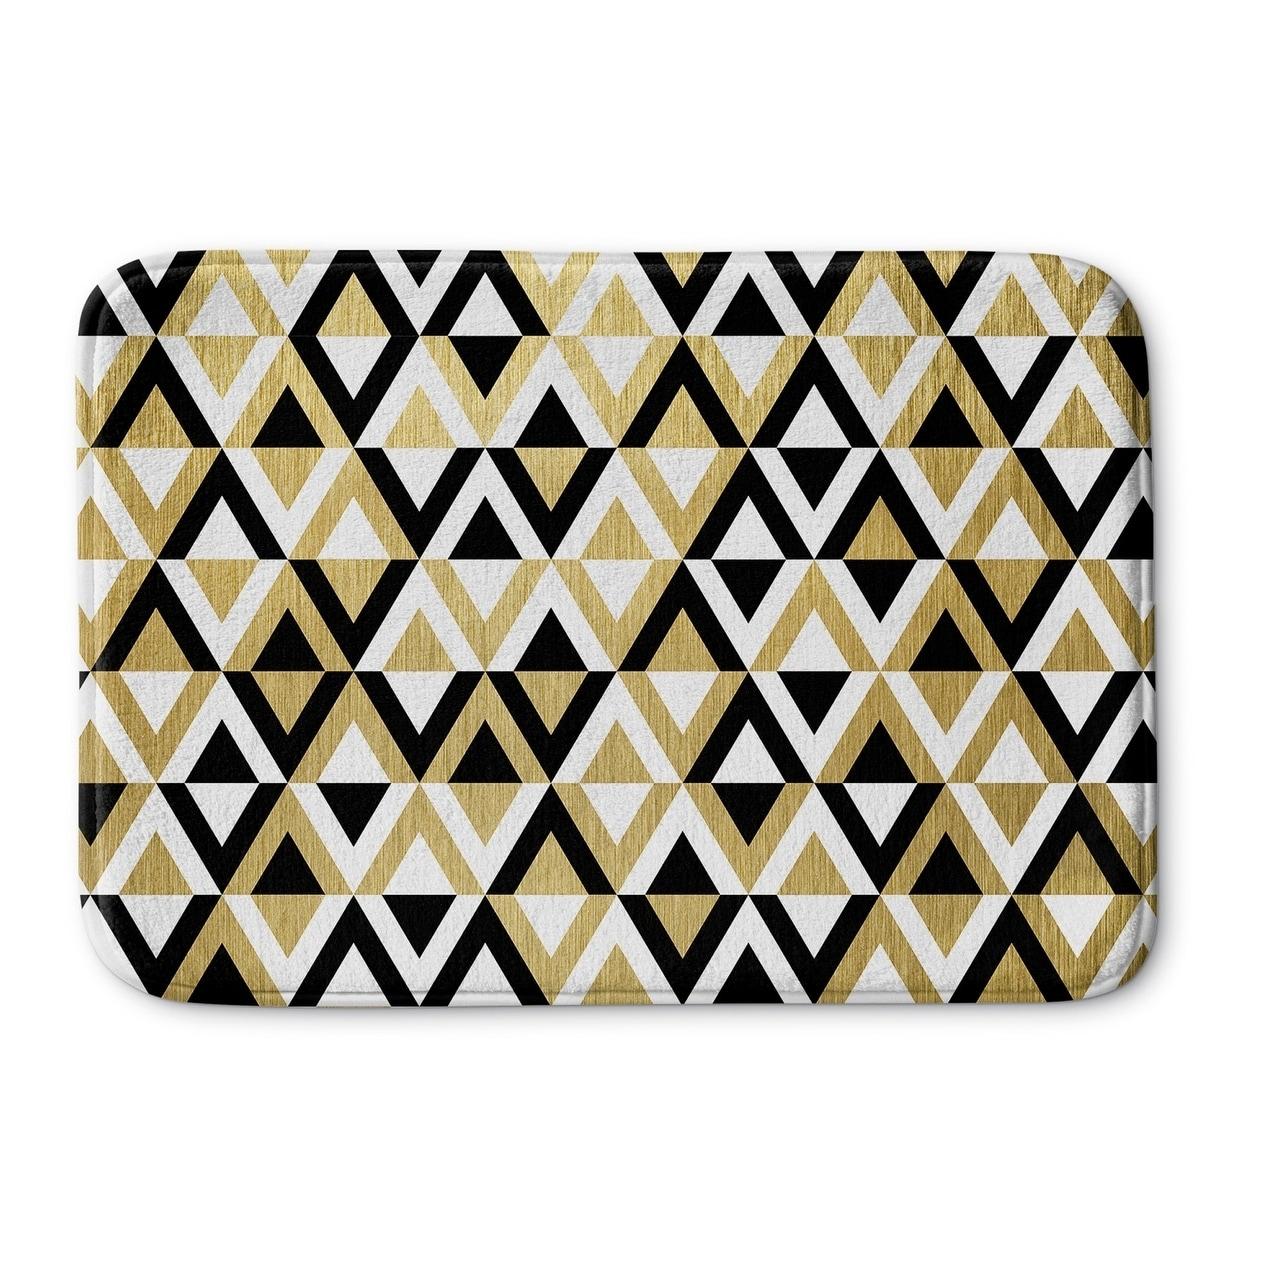 pinzon black luxury and kitchen amazon white banded mat cotton com bath home dp mats